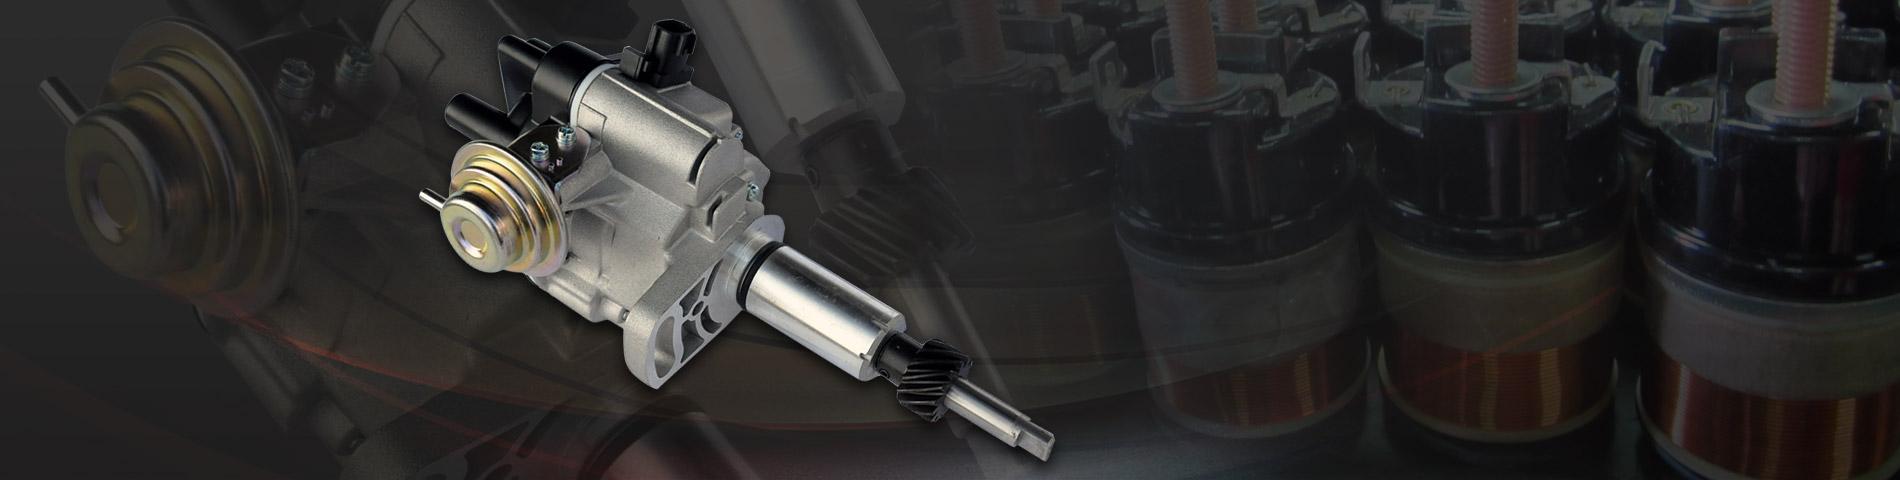 Supply Alternators, Starters, and Distributors